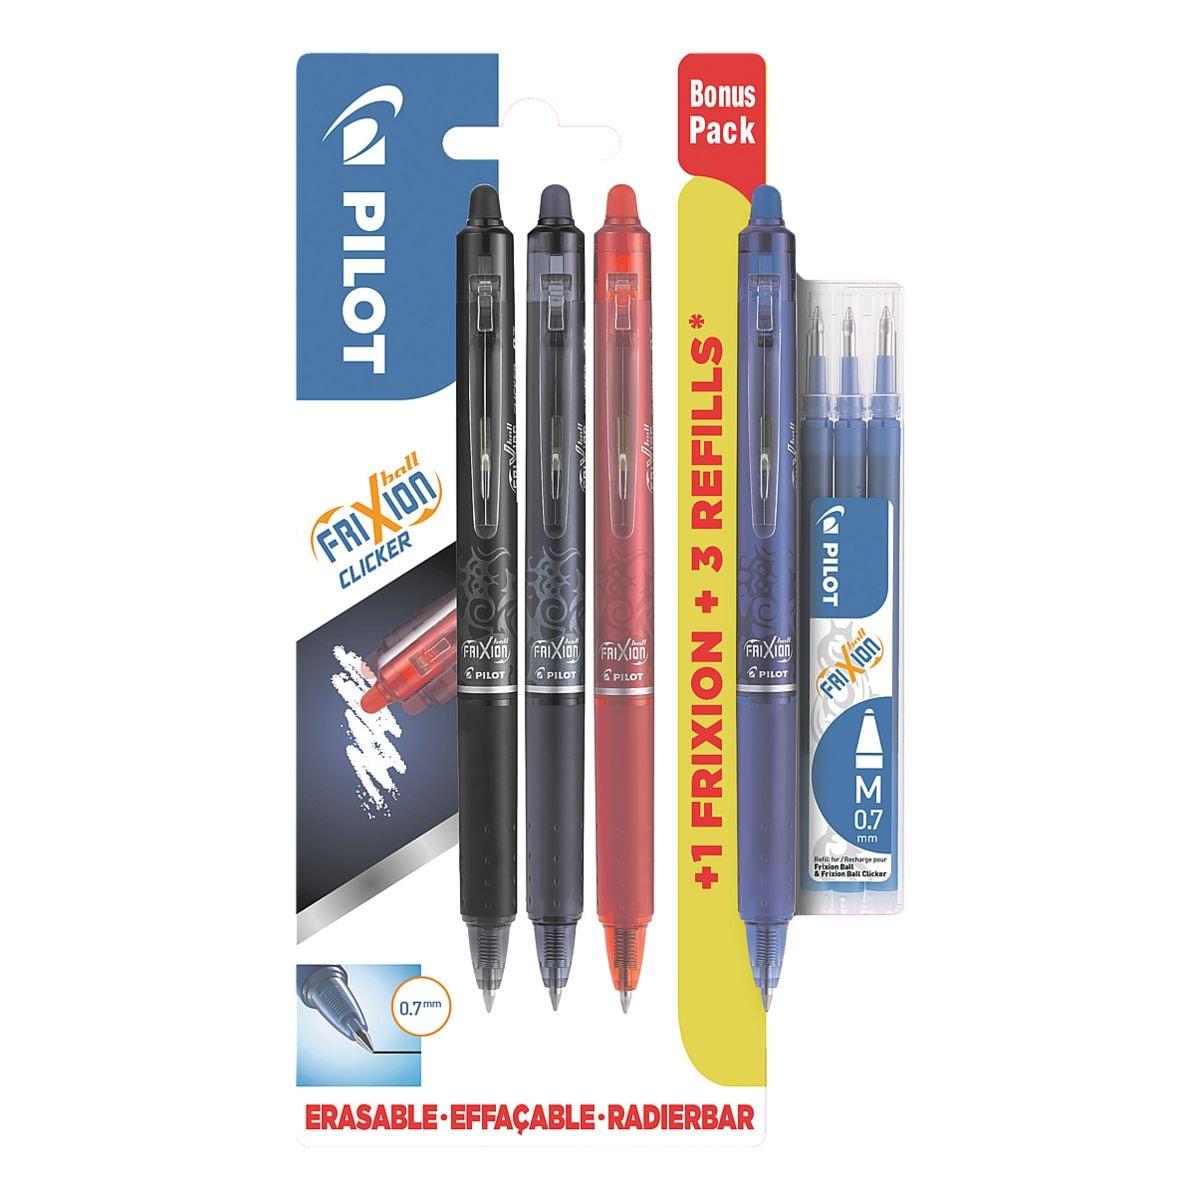 Tintenroller Pilot Bonuspack FriXion Clicker 0.7, radierbar inkl. 3er-Set Minen (blau)